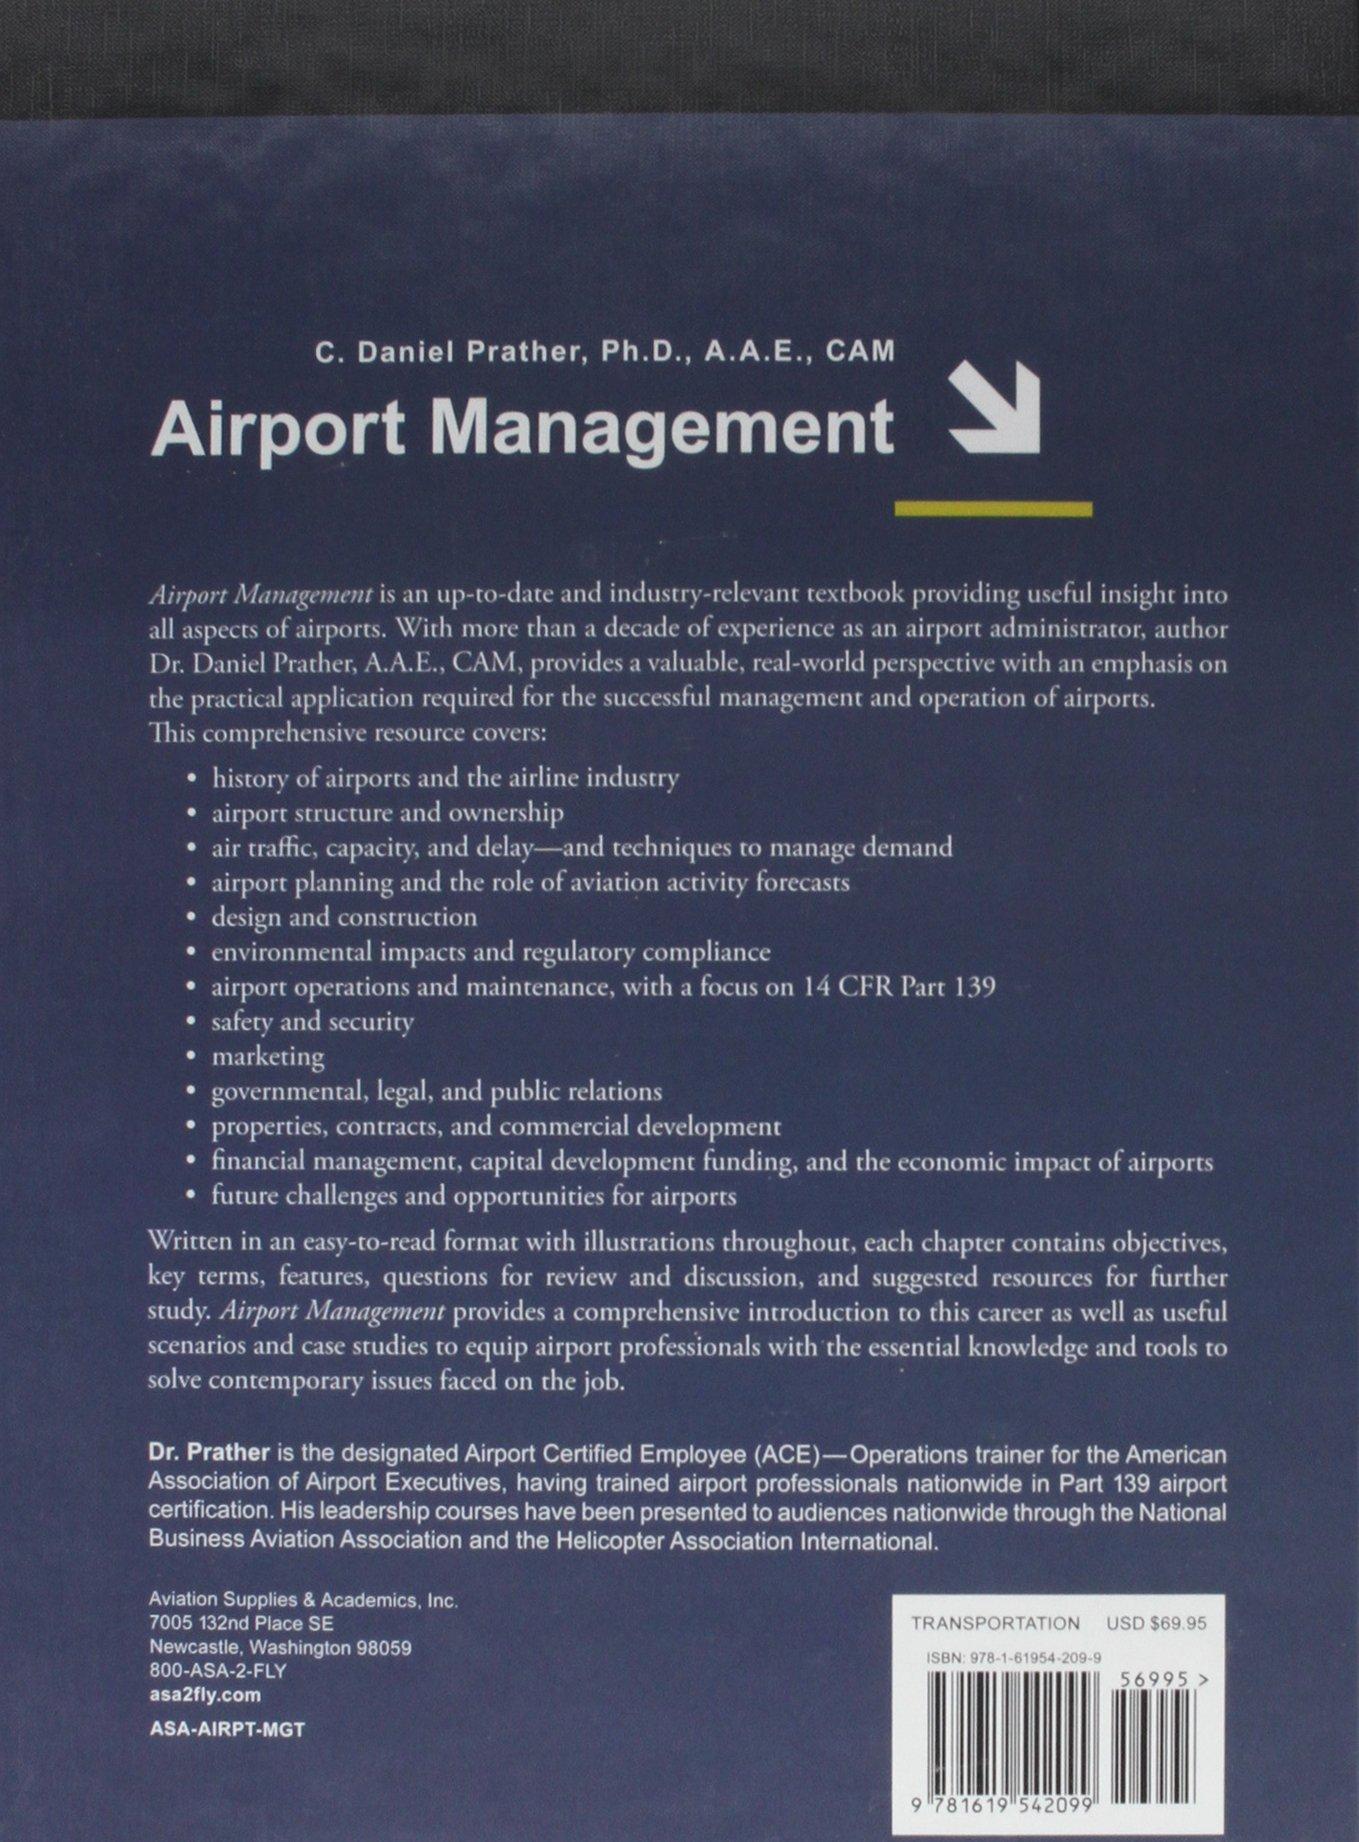 Airport Management: C. Daniel Prather, Richard N. Steele: 9781619542099:  Amazon.com: Books